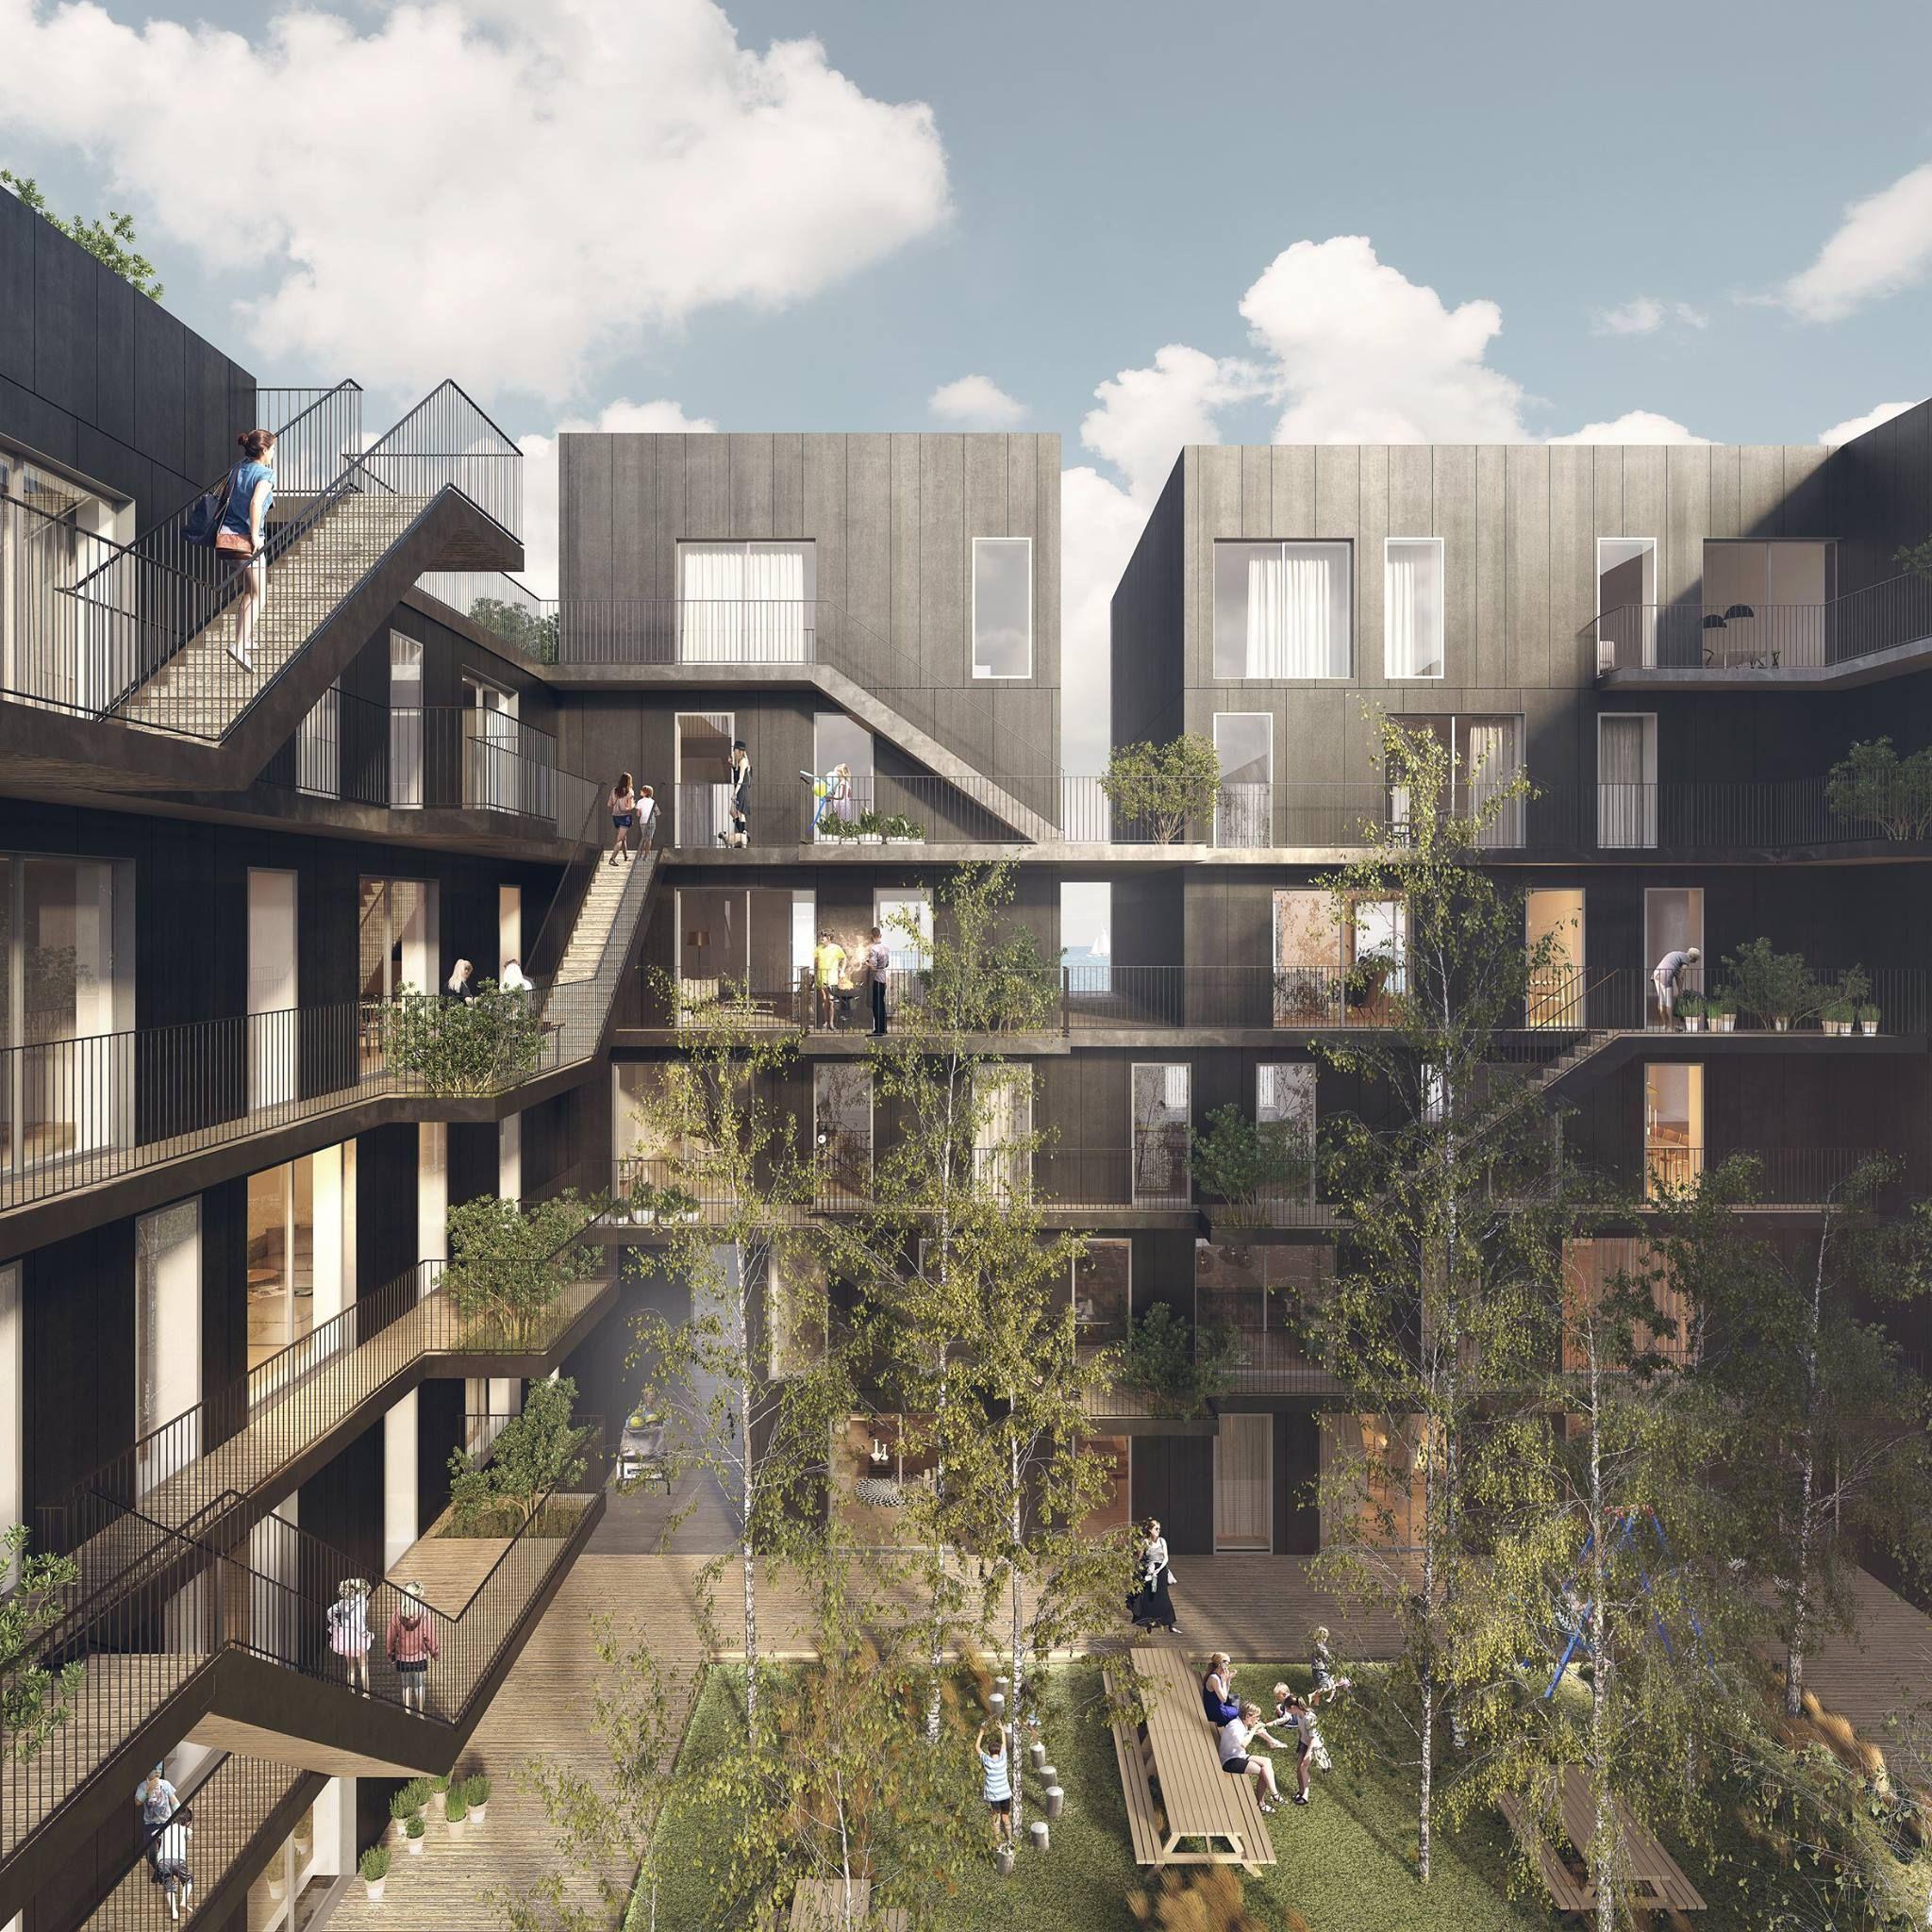 Innenhof In Sozialem Wohnungsbau